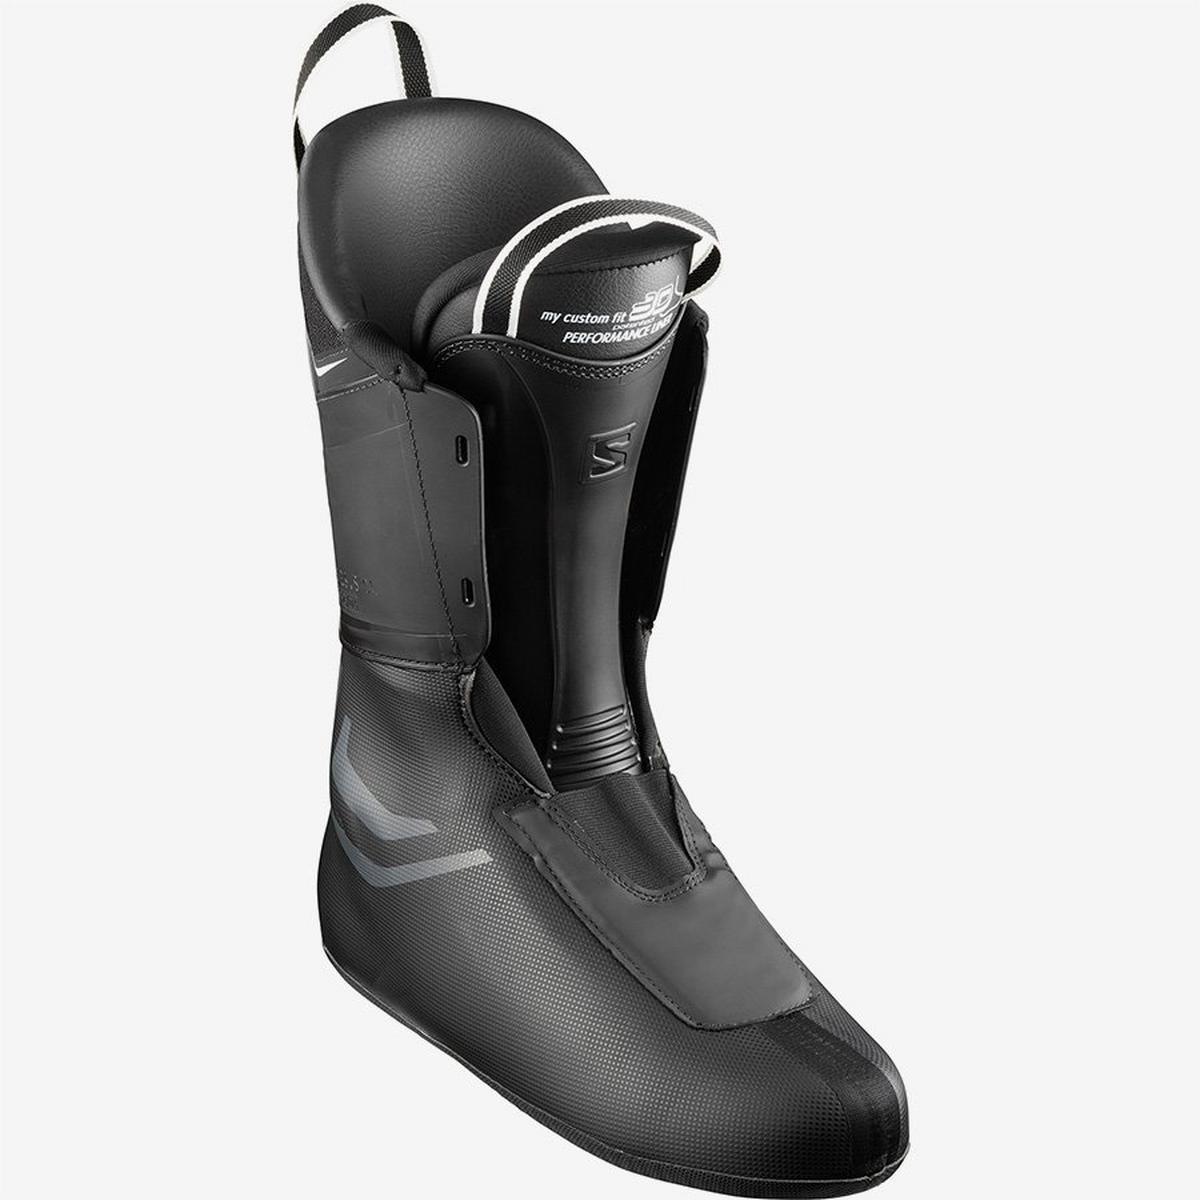 Salomon Men's S/PRO 100 Ski Boot - Black